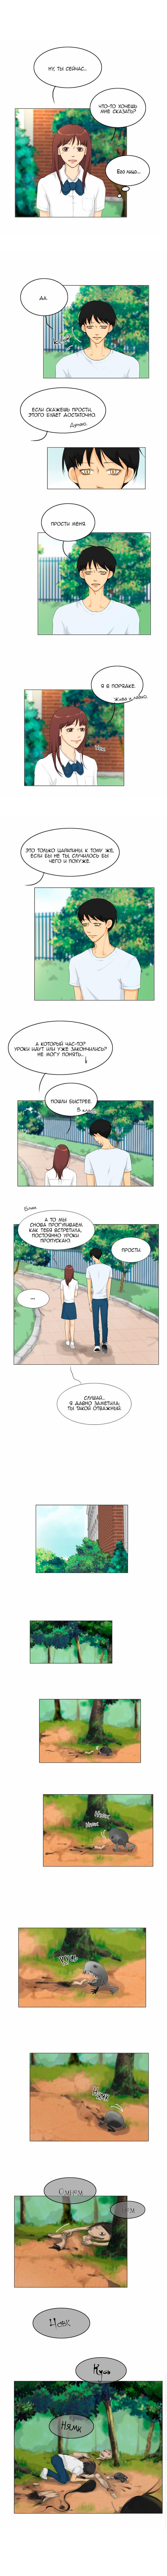 https://r1.ninemanga.com/comics/pic2/8/31048/426339/1535044245111.jpg Page 6